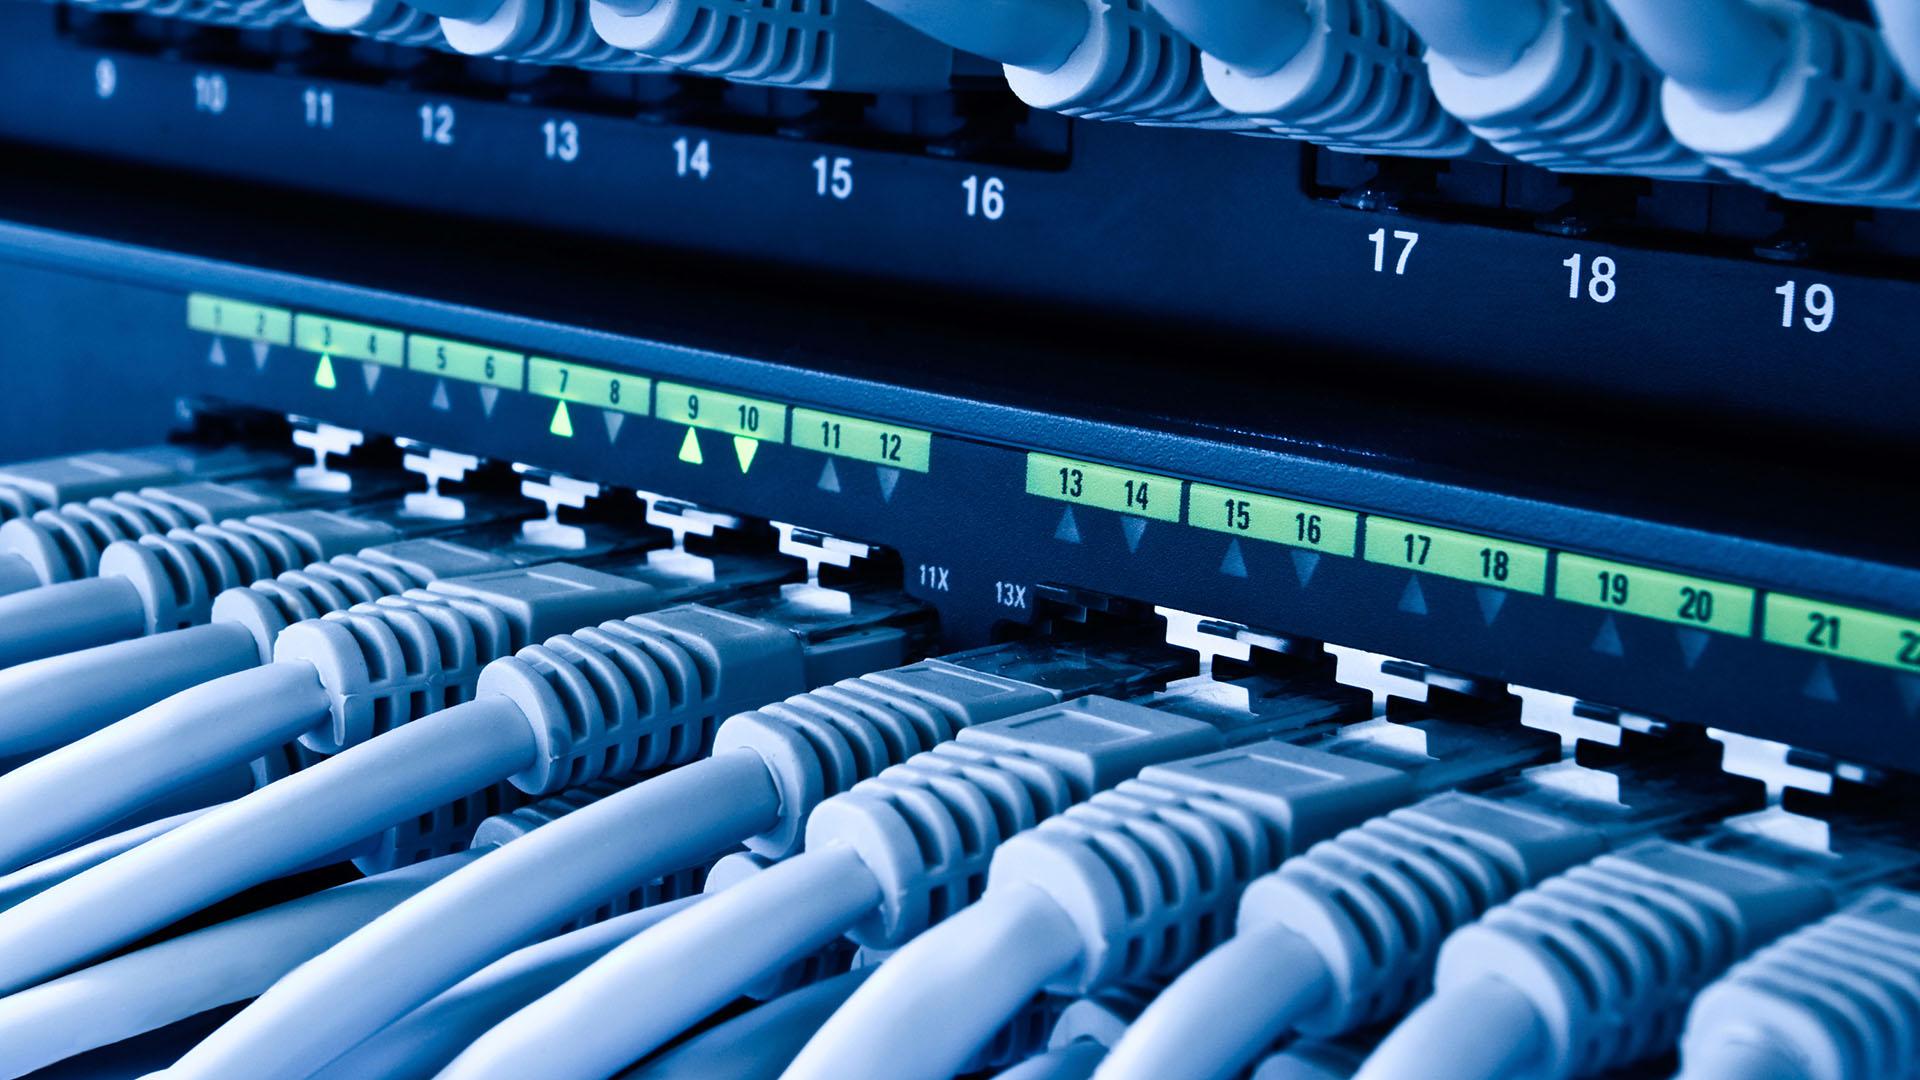 Satellite Beach Florida Top Voice & Data Network Cabling Provider